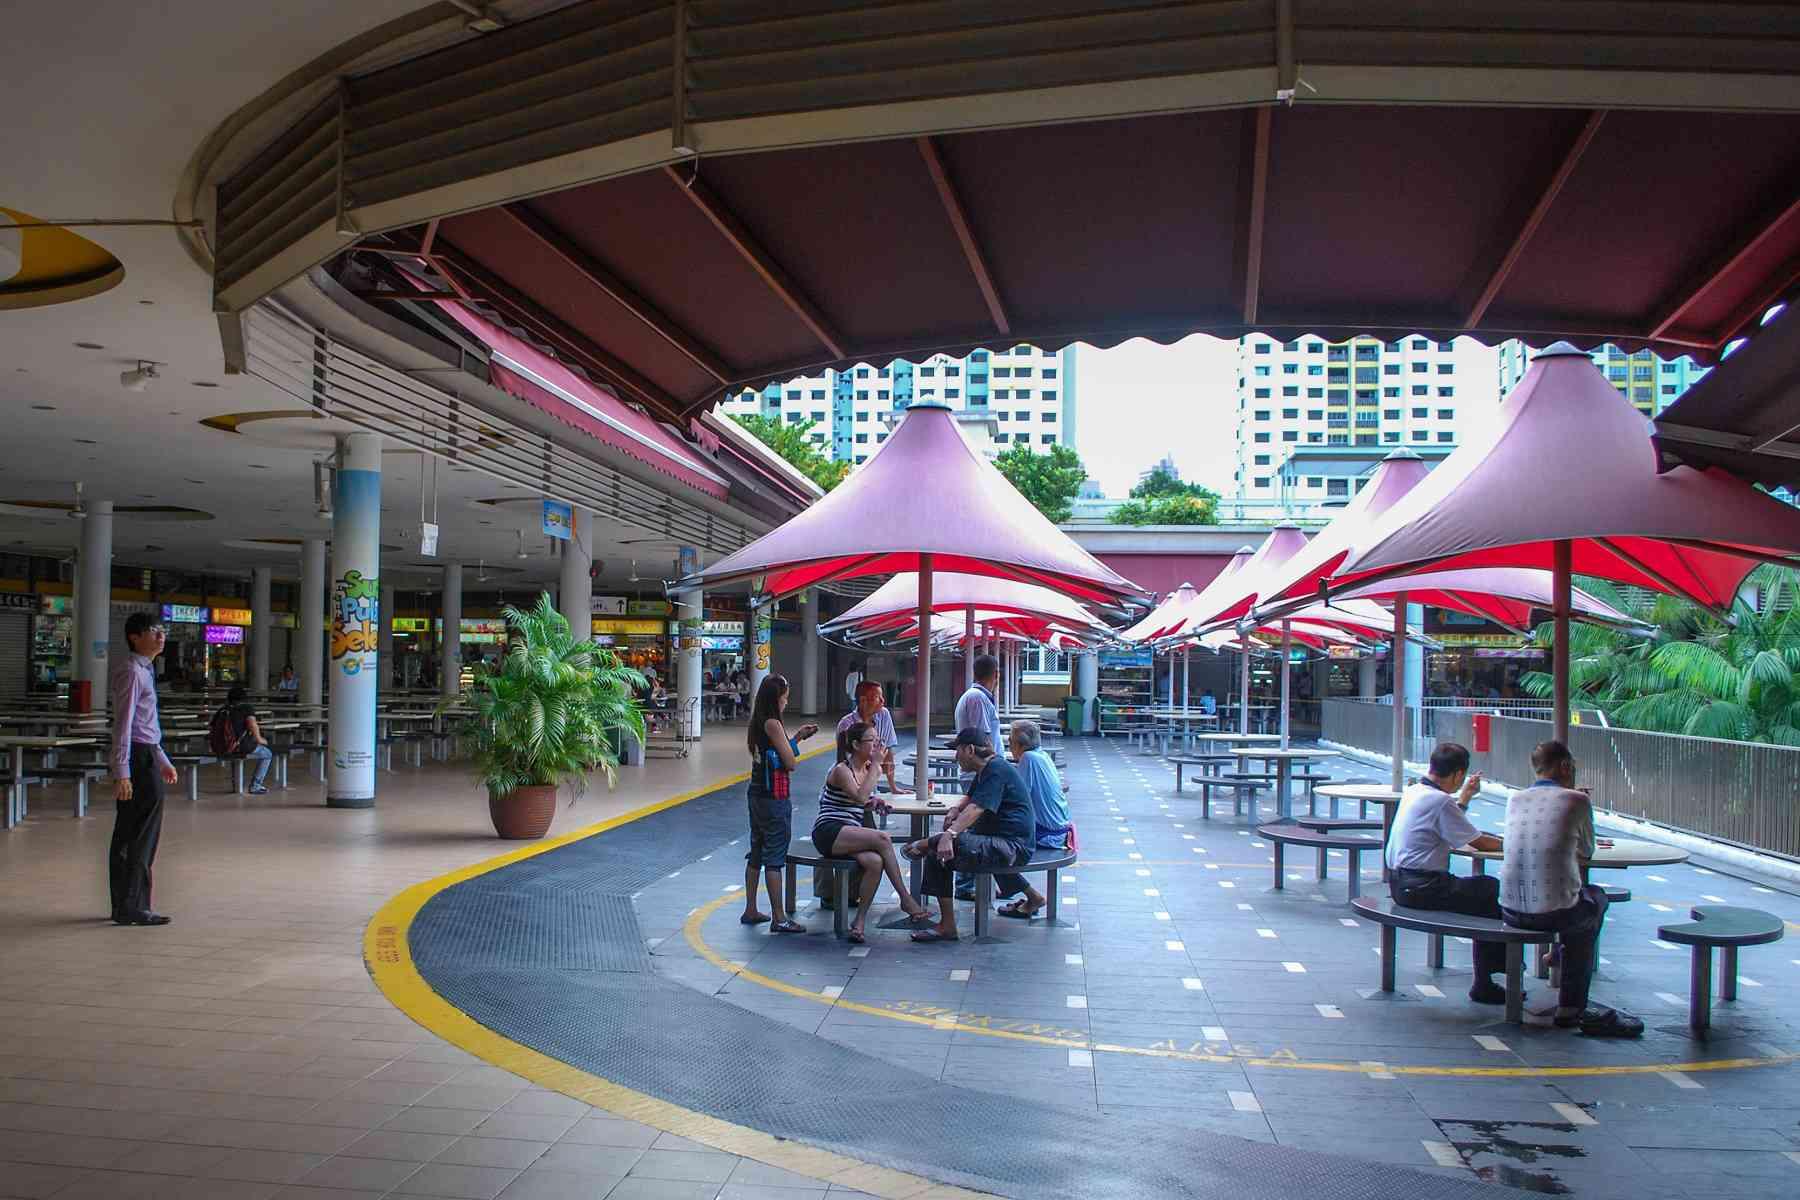 Tiong Bahru Hawker Center, Singapore